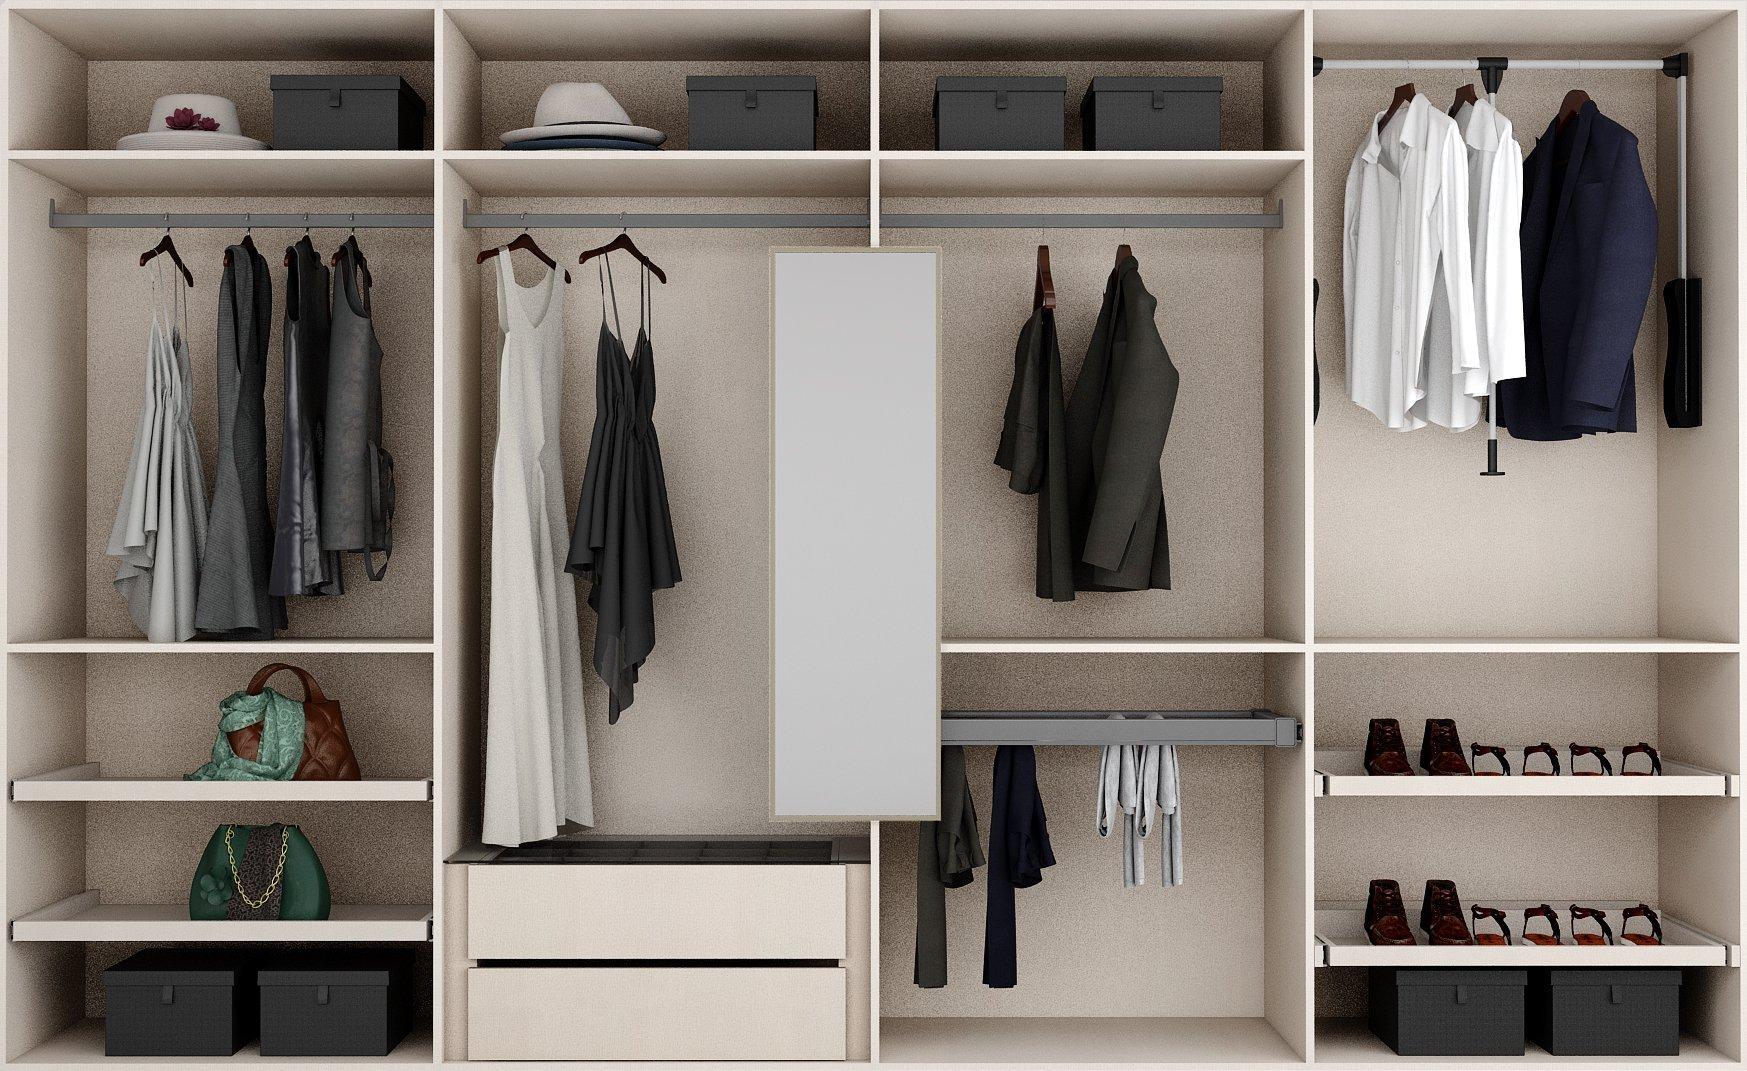 Wardrobe accessories options